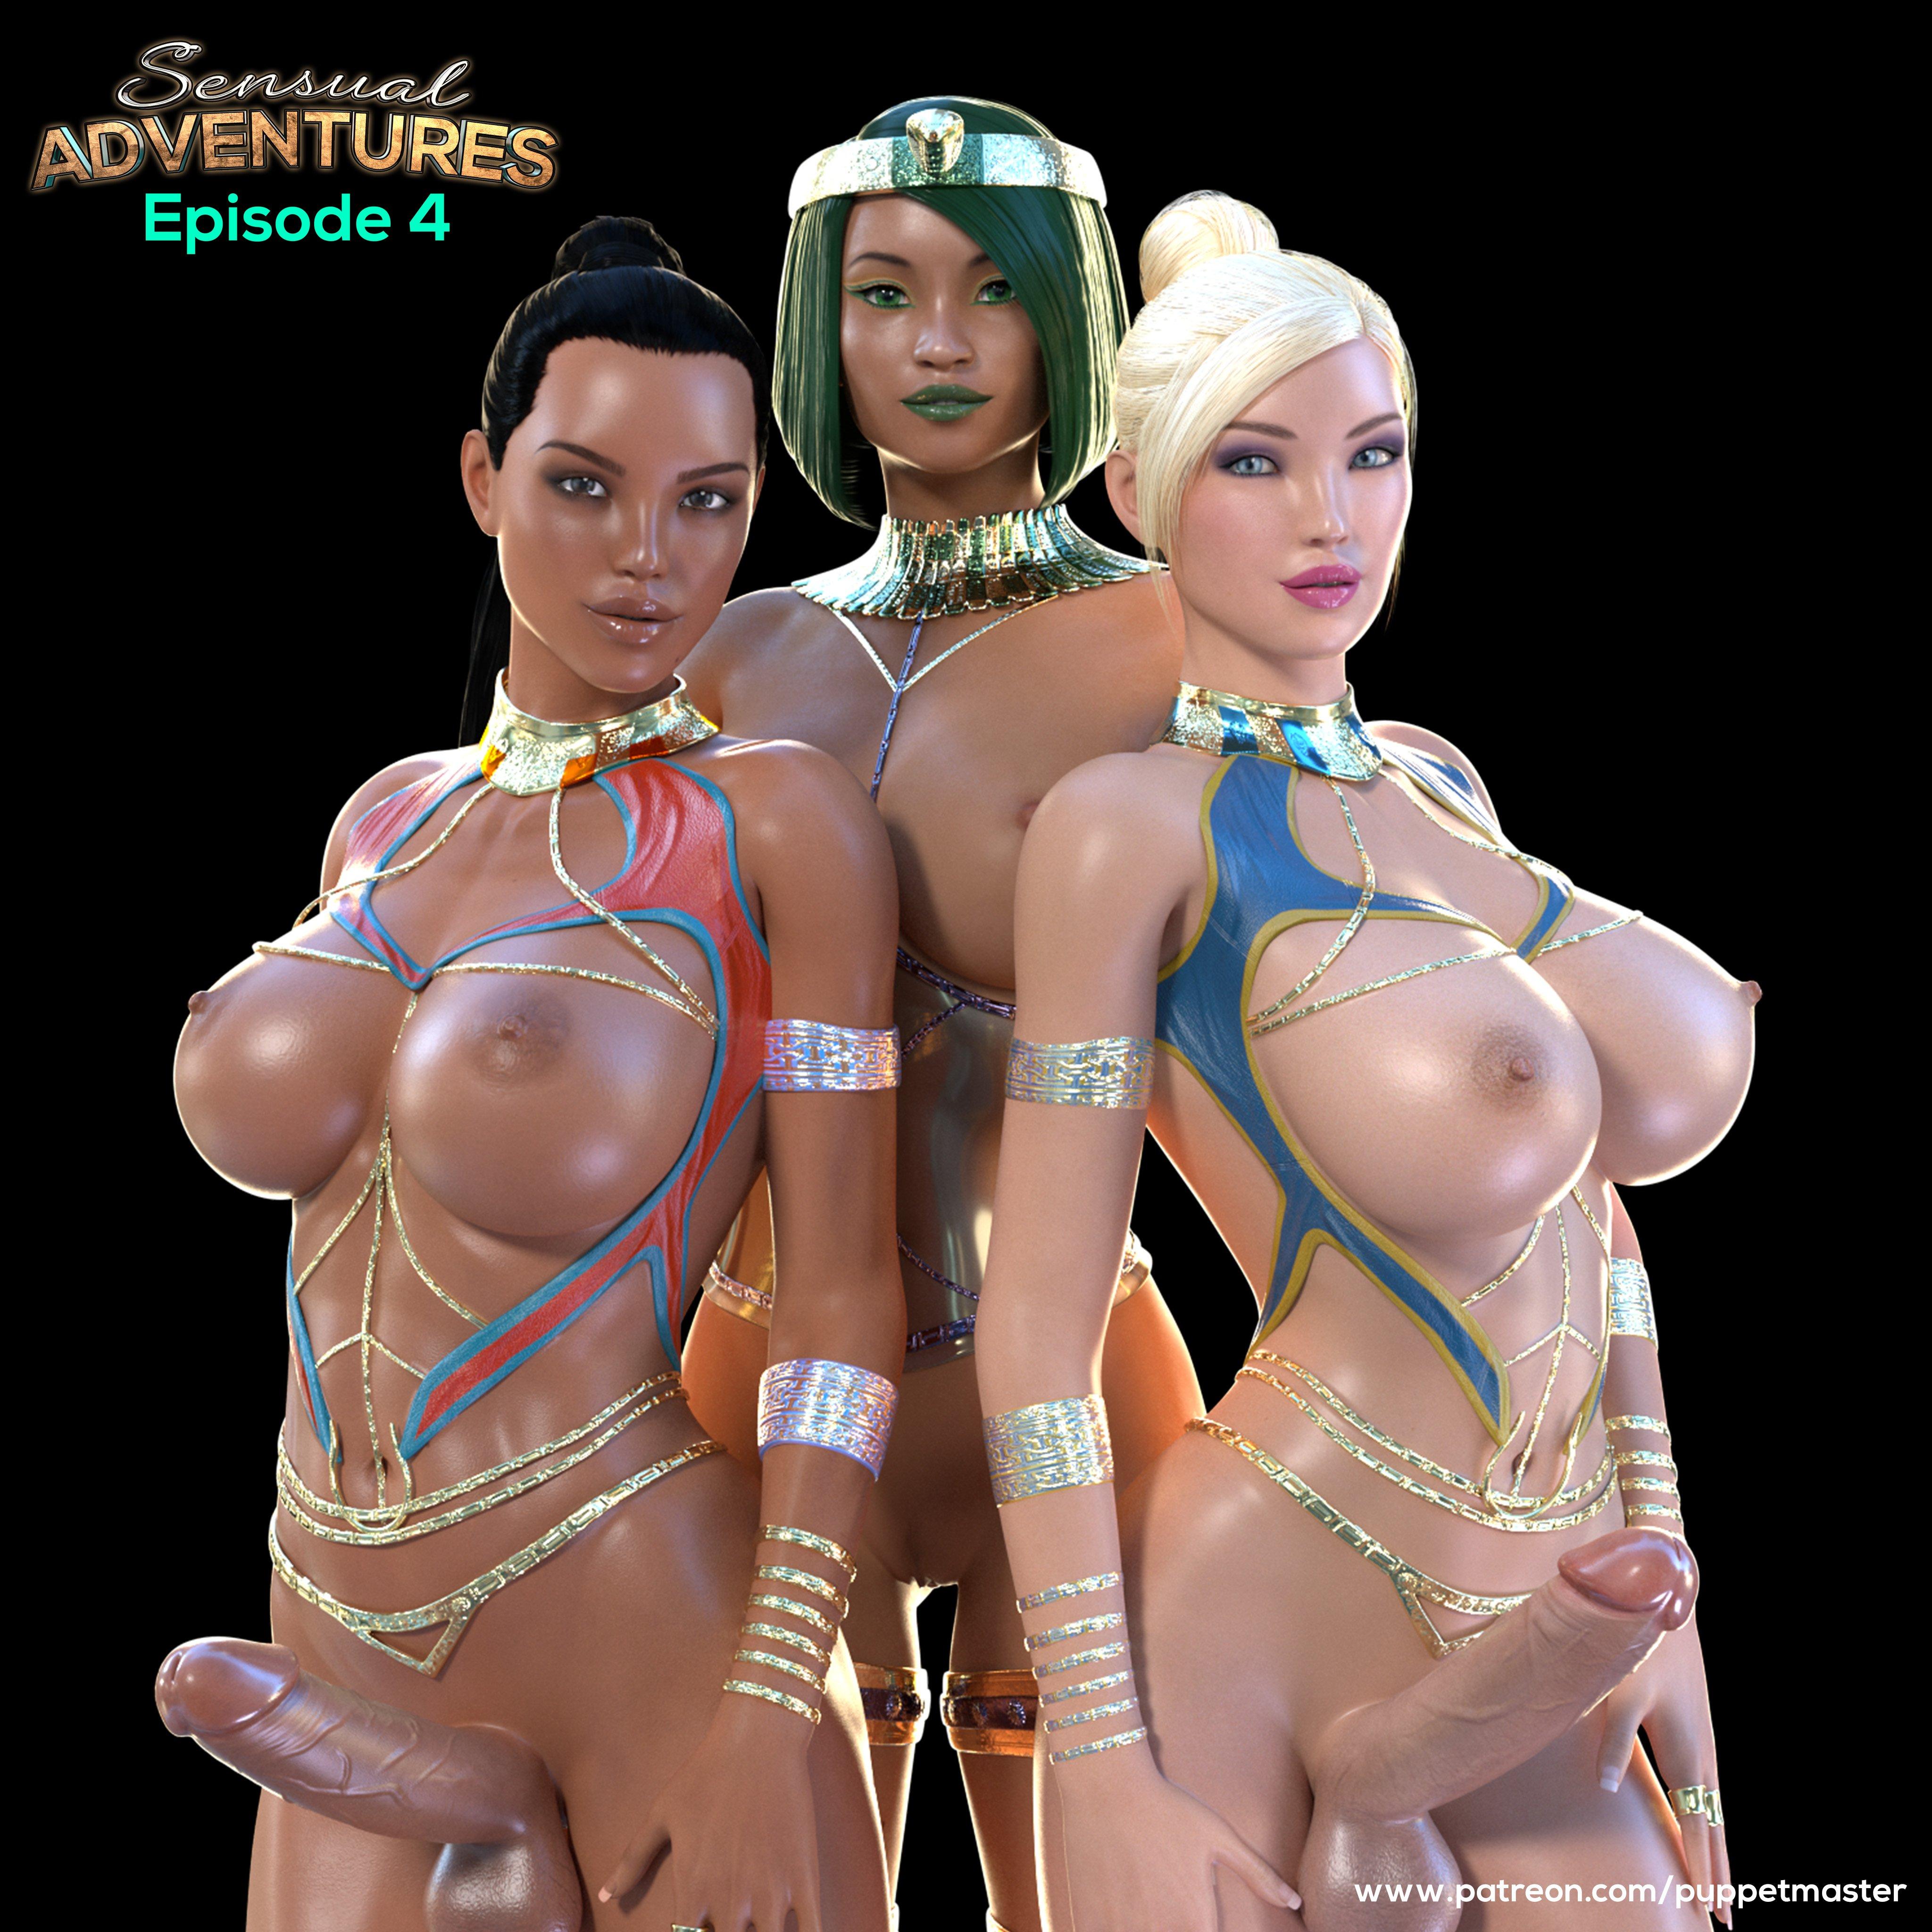 Sensual Adventures